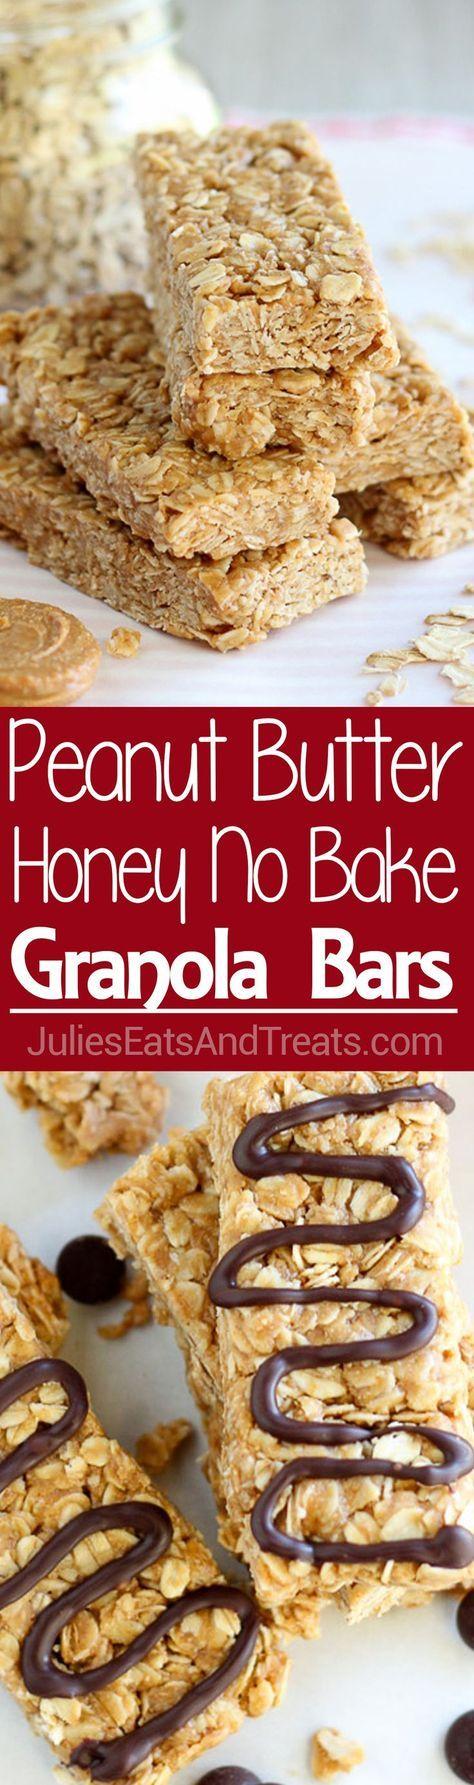 Peanut Butter Honey No Bake Granola Bars ~ Easy, No Bake Granola Bars are Flavored with Peanut Butter and Sweetened with Honey!…